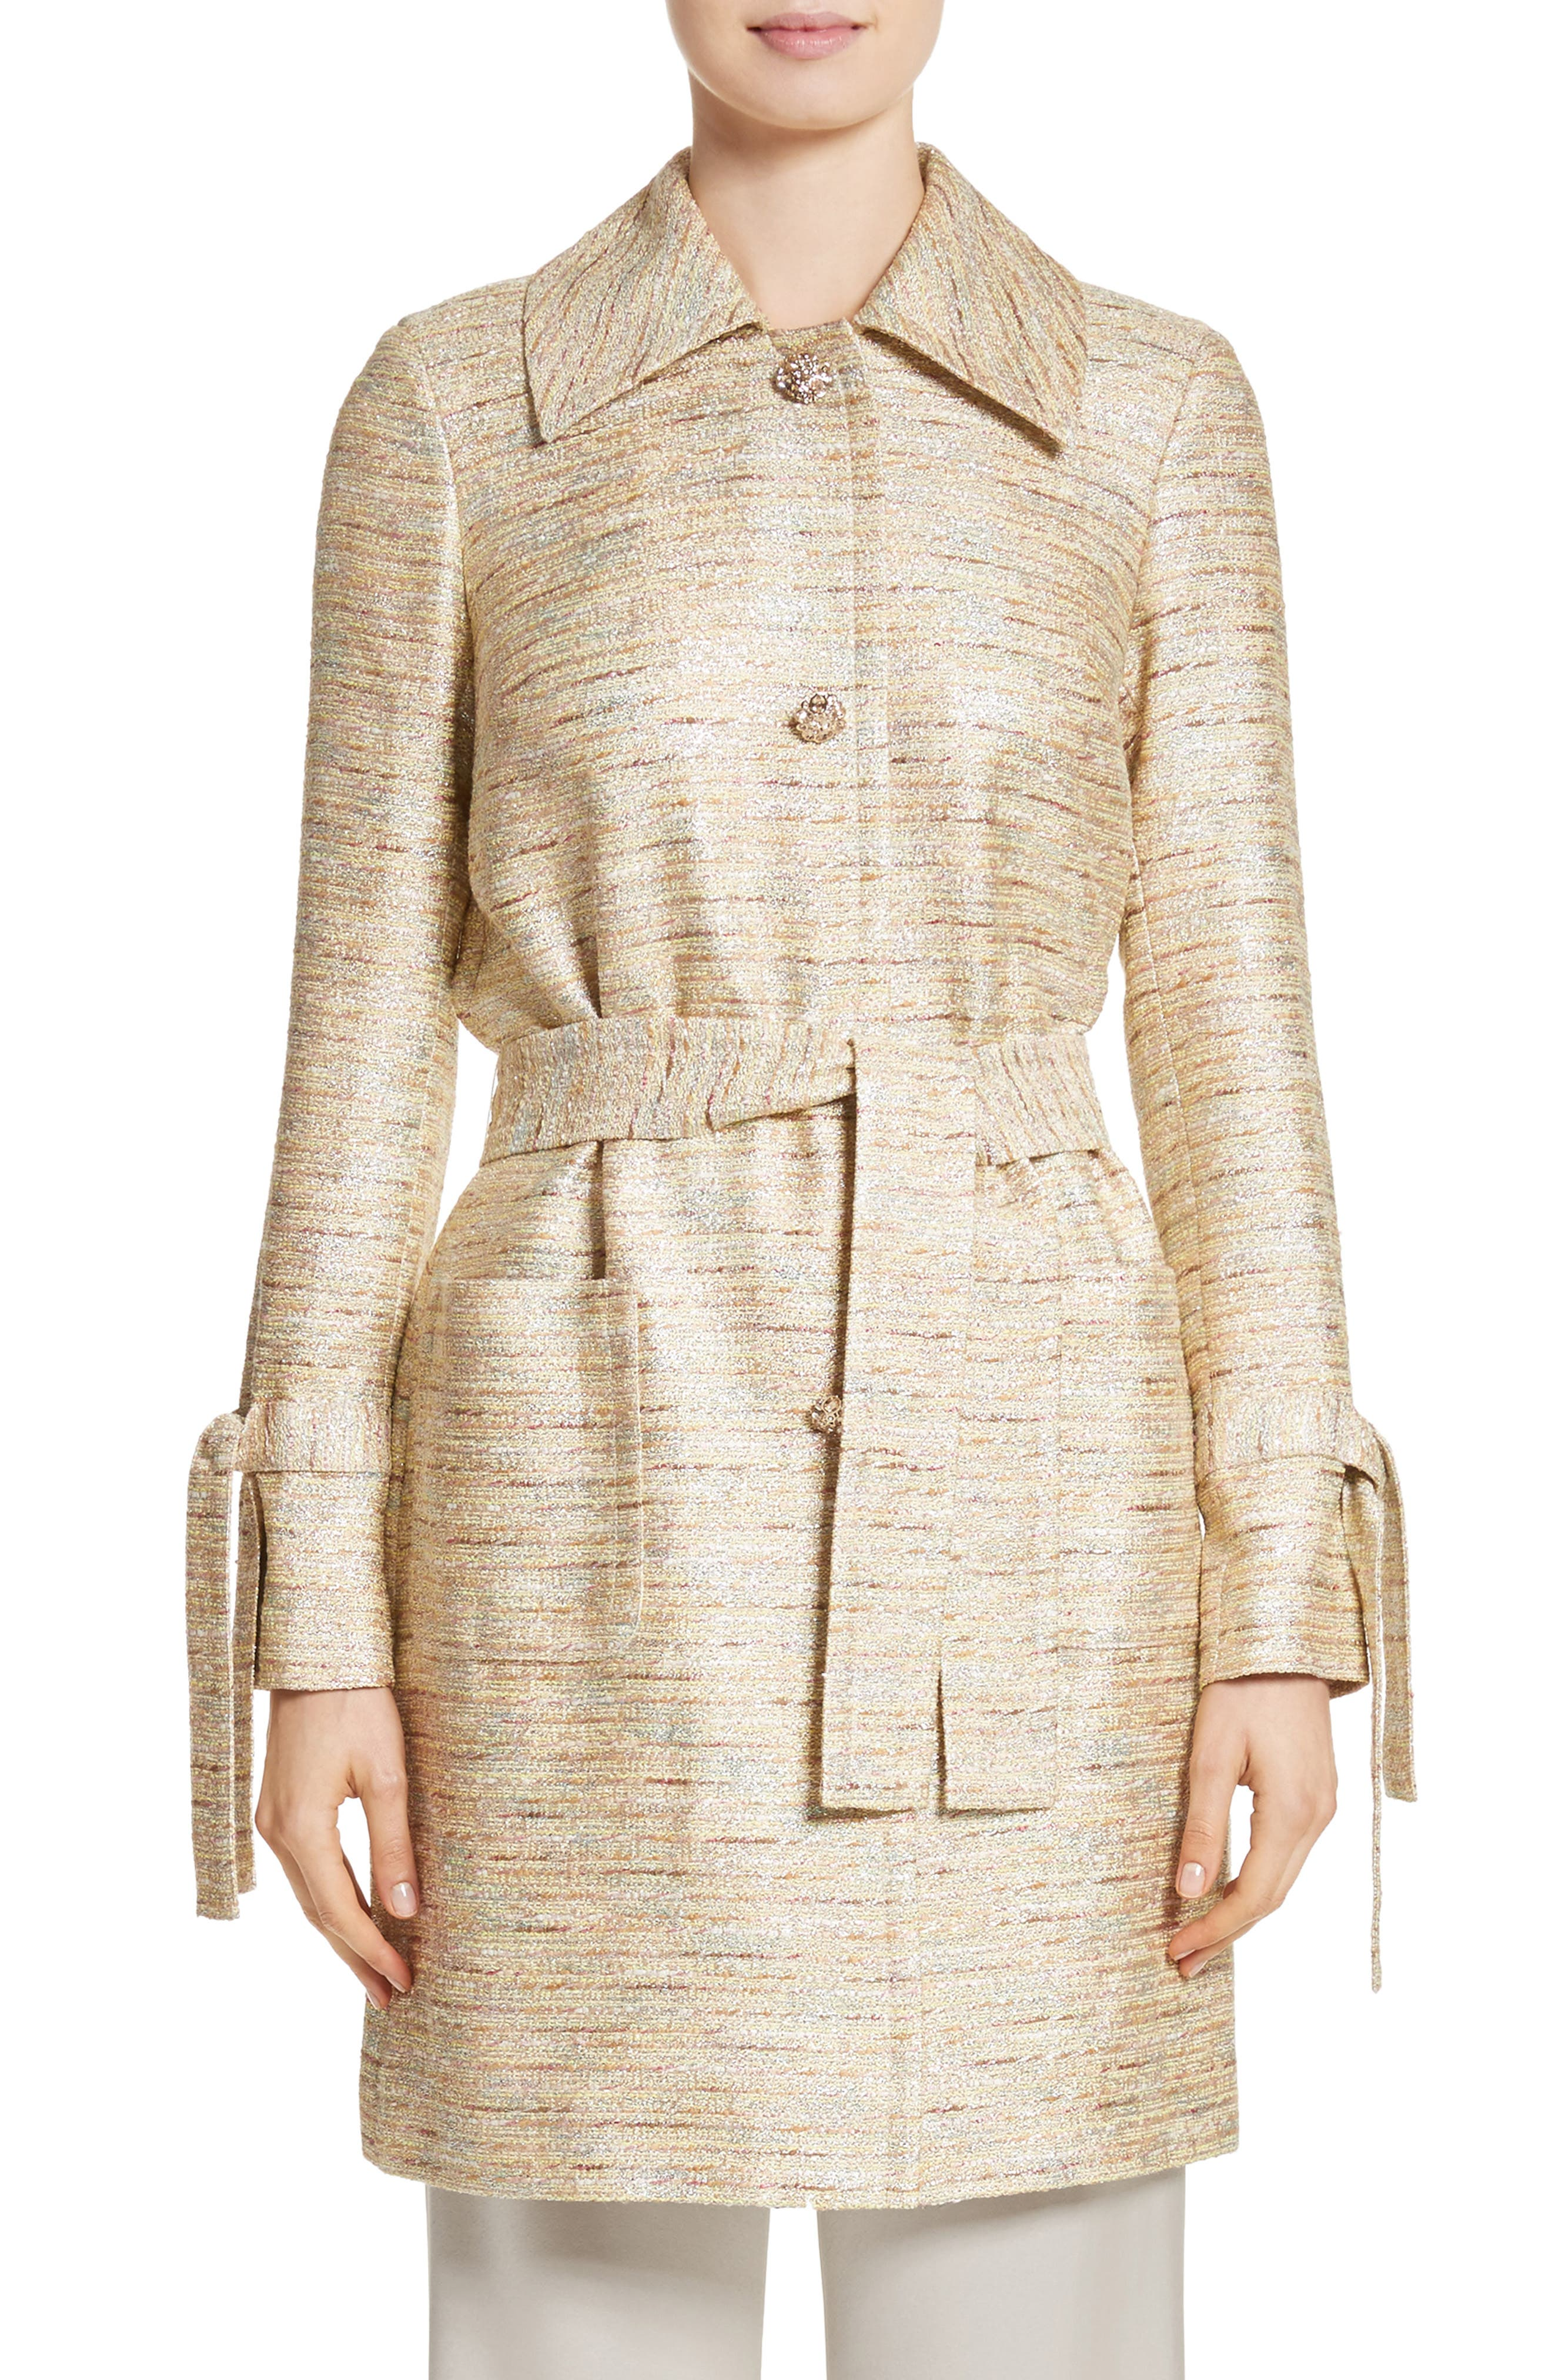 Alternate Image 1 Selected - St. John Collection Metallic Tweed Coat